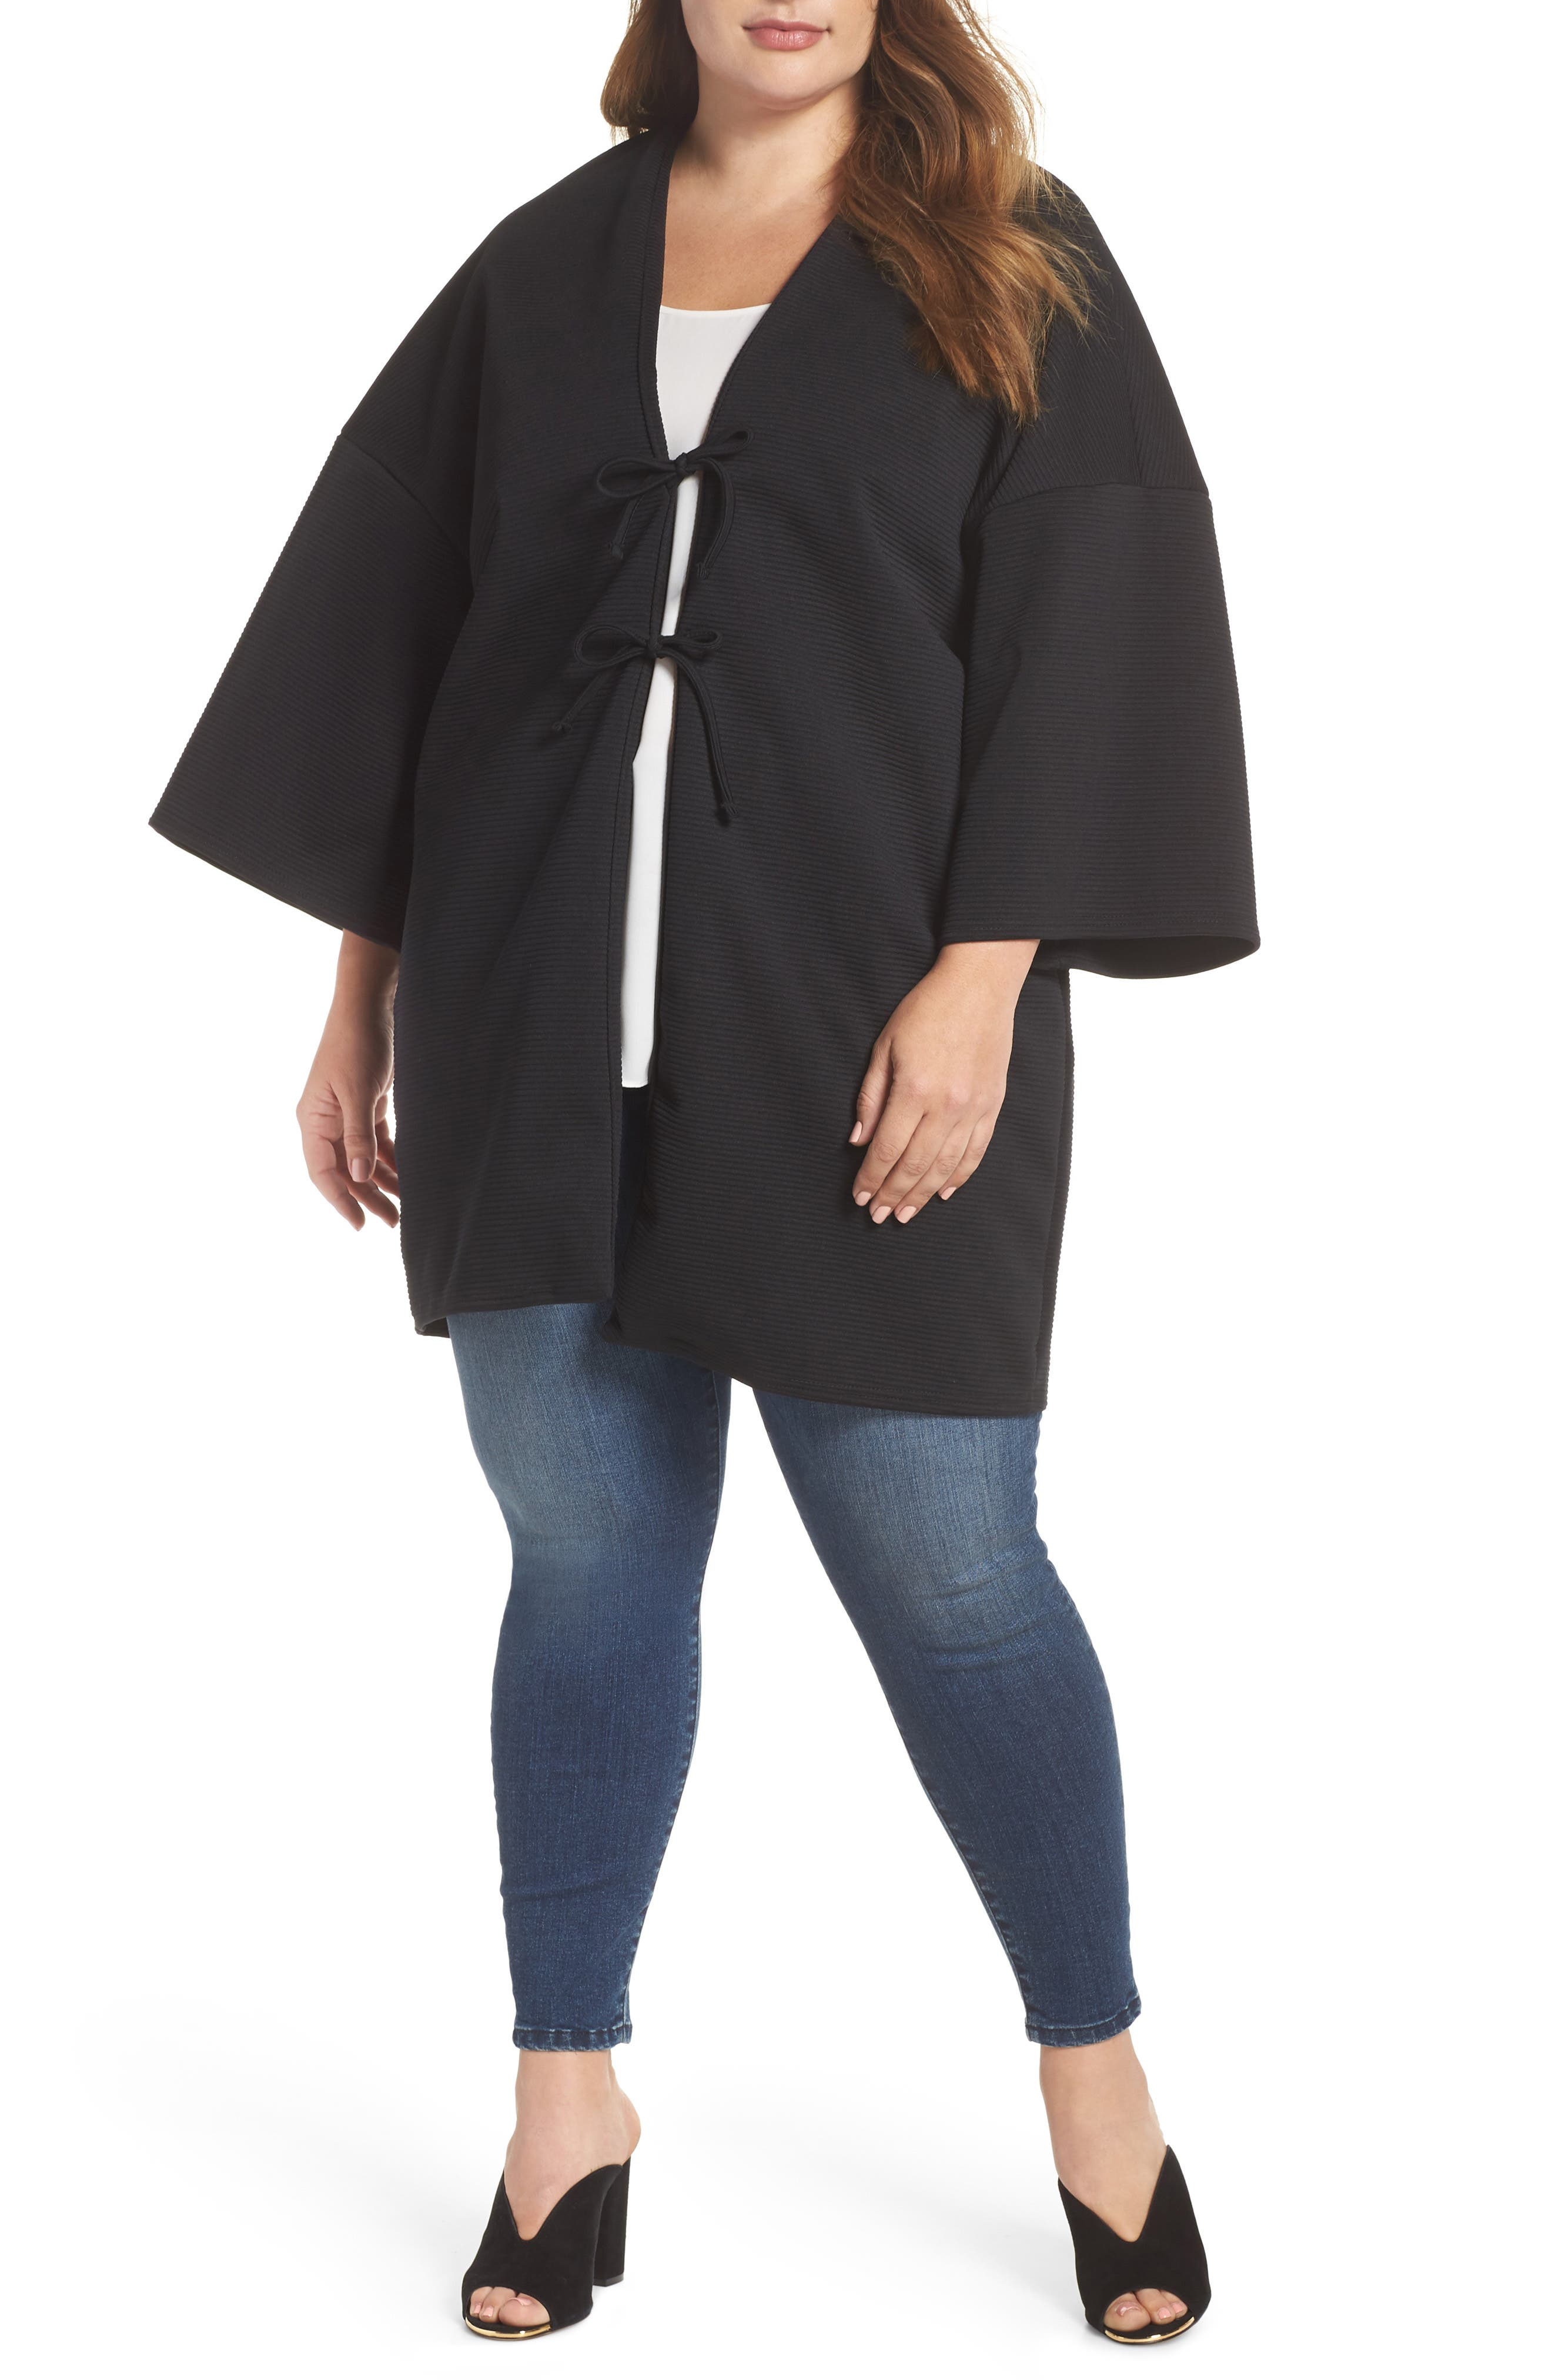 ELVI The Lacquer Bonded Jersey Kimono (Plus Size)